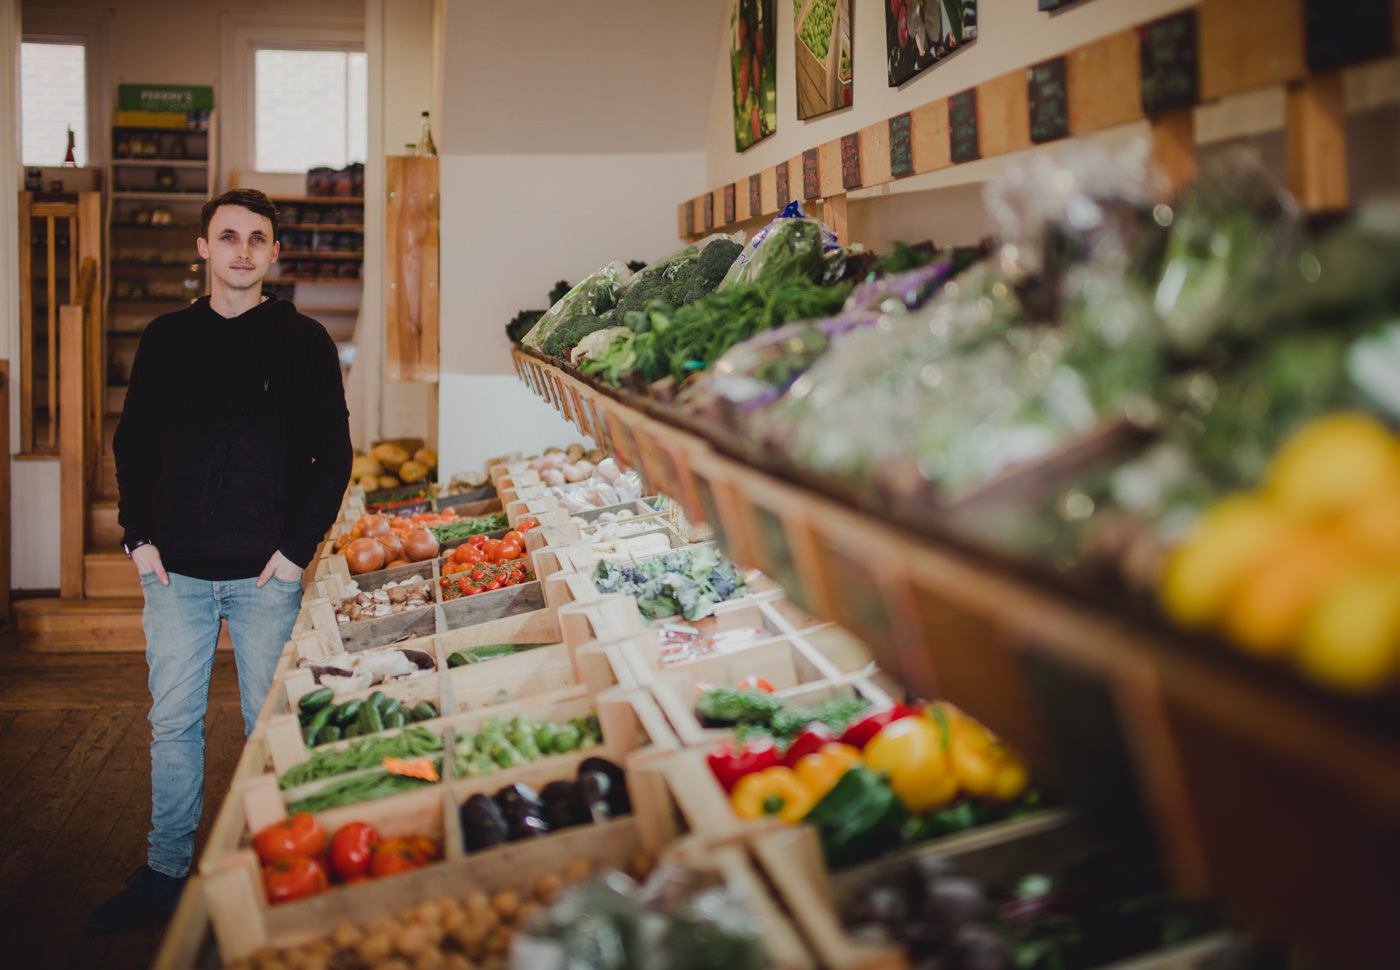 Locality greengrocer, Steve Fuller, Camden Road, Royal Tunbridge Wells